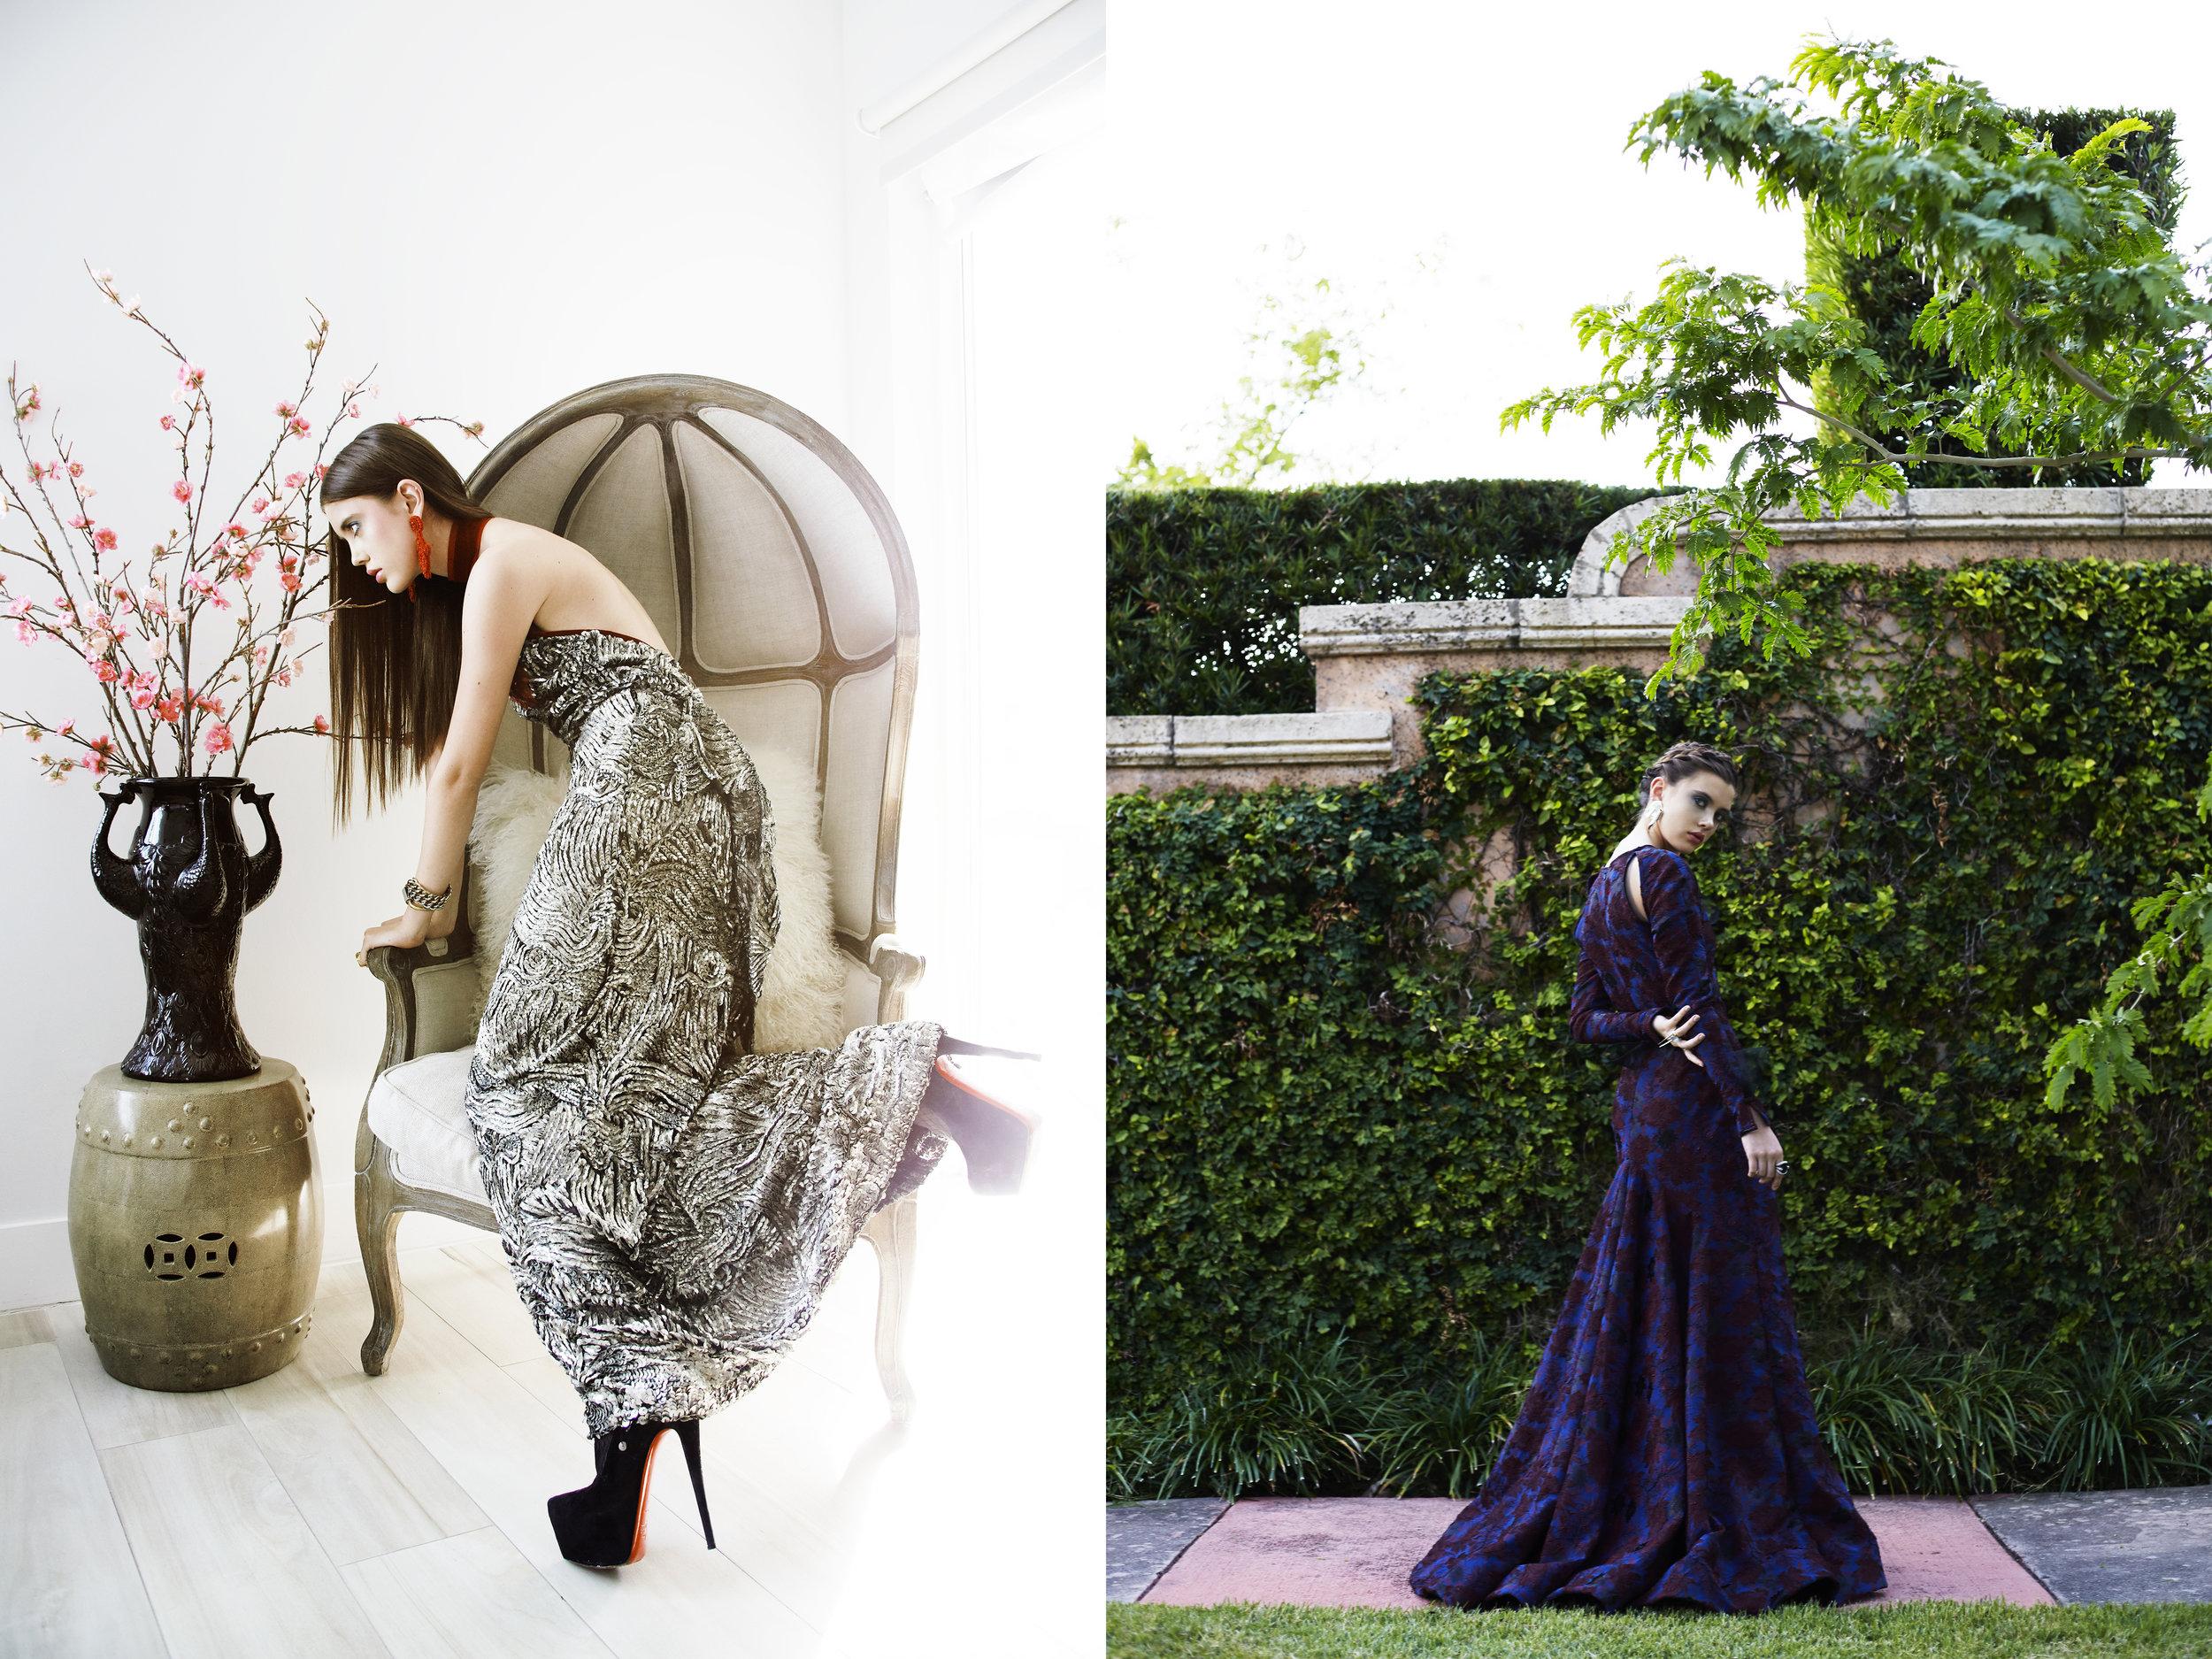 ML_Sophia_couture610.jpg